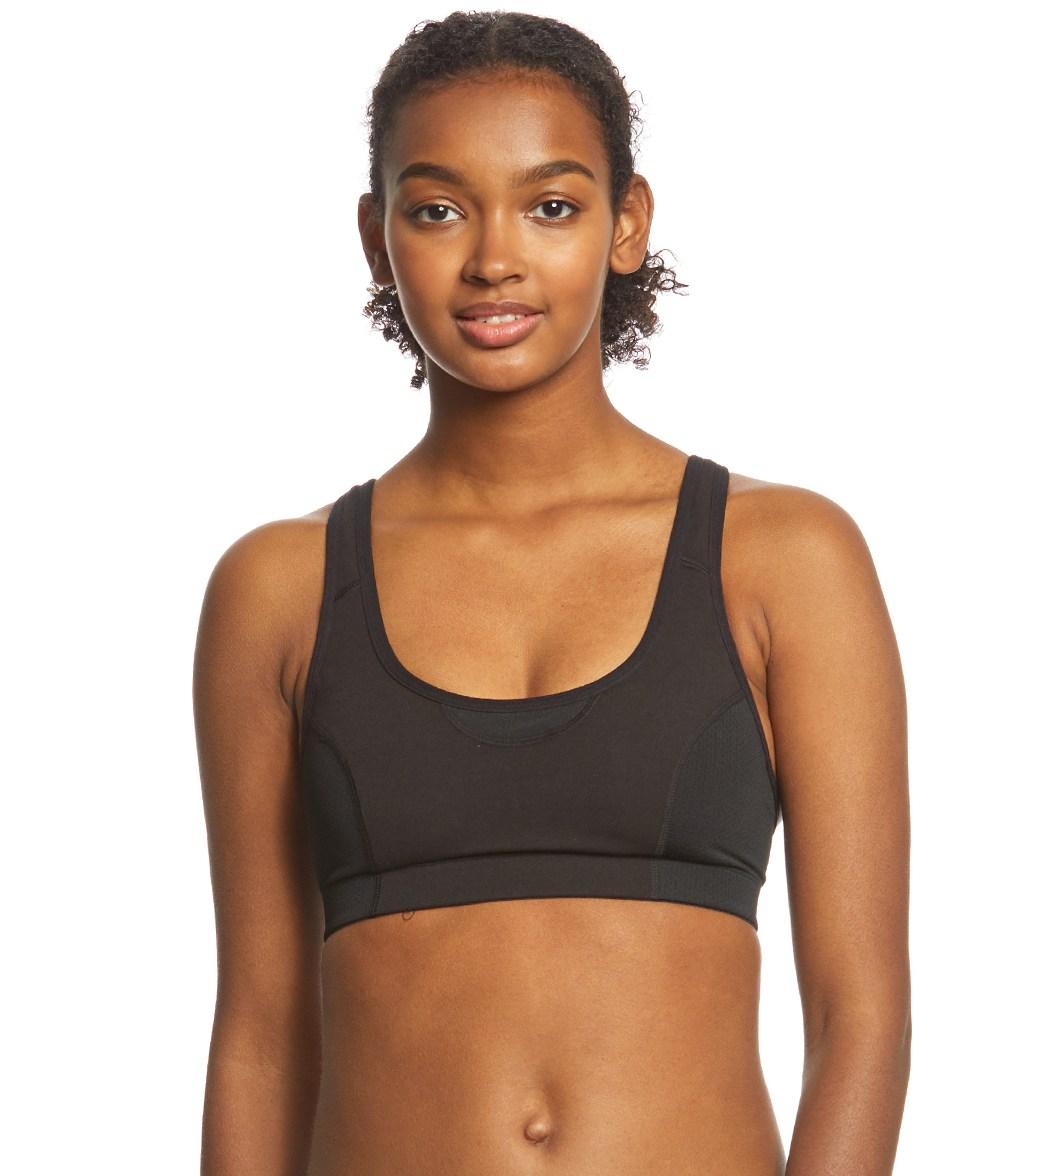 535db53641 Danskin Wicking Cotton Comfort Yoga Sports Bra at YogaOutlet.com